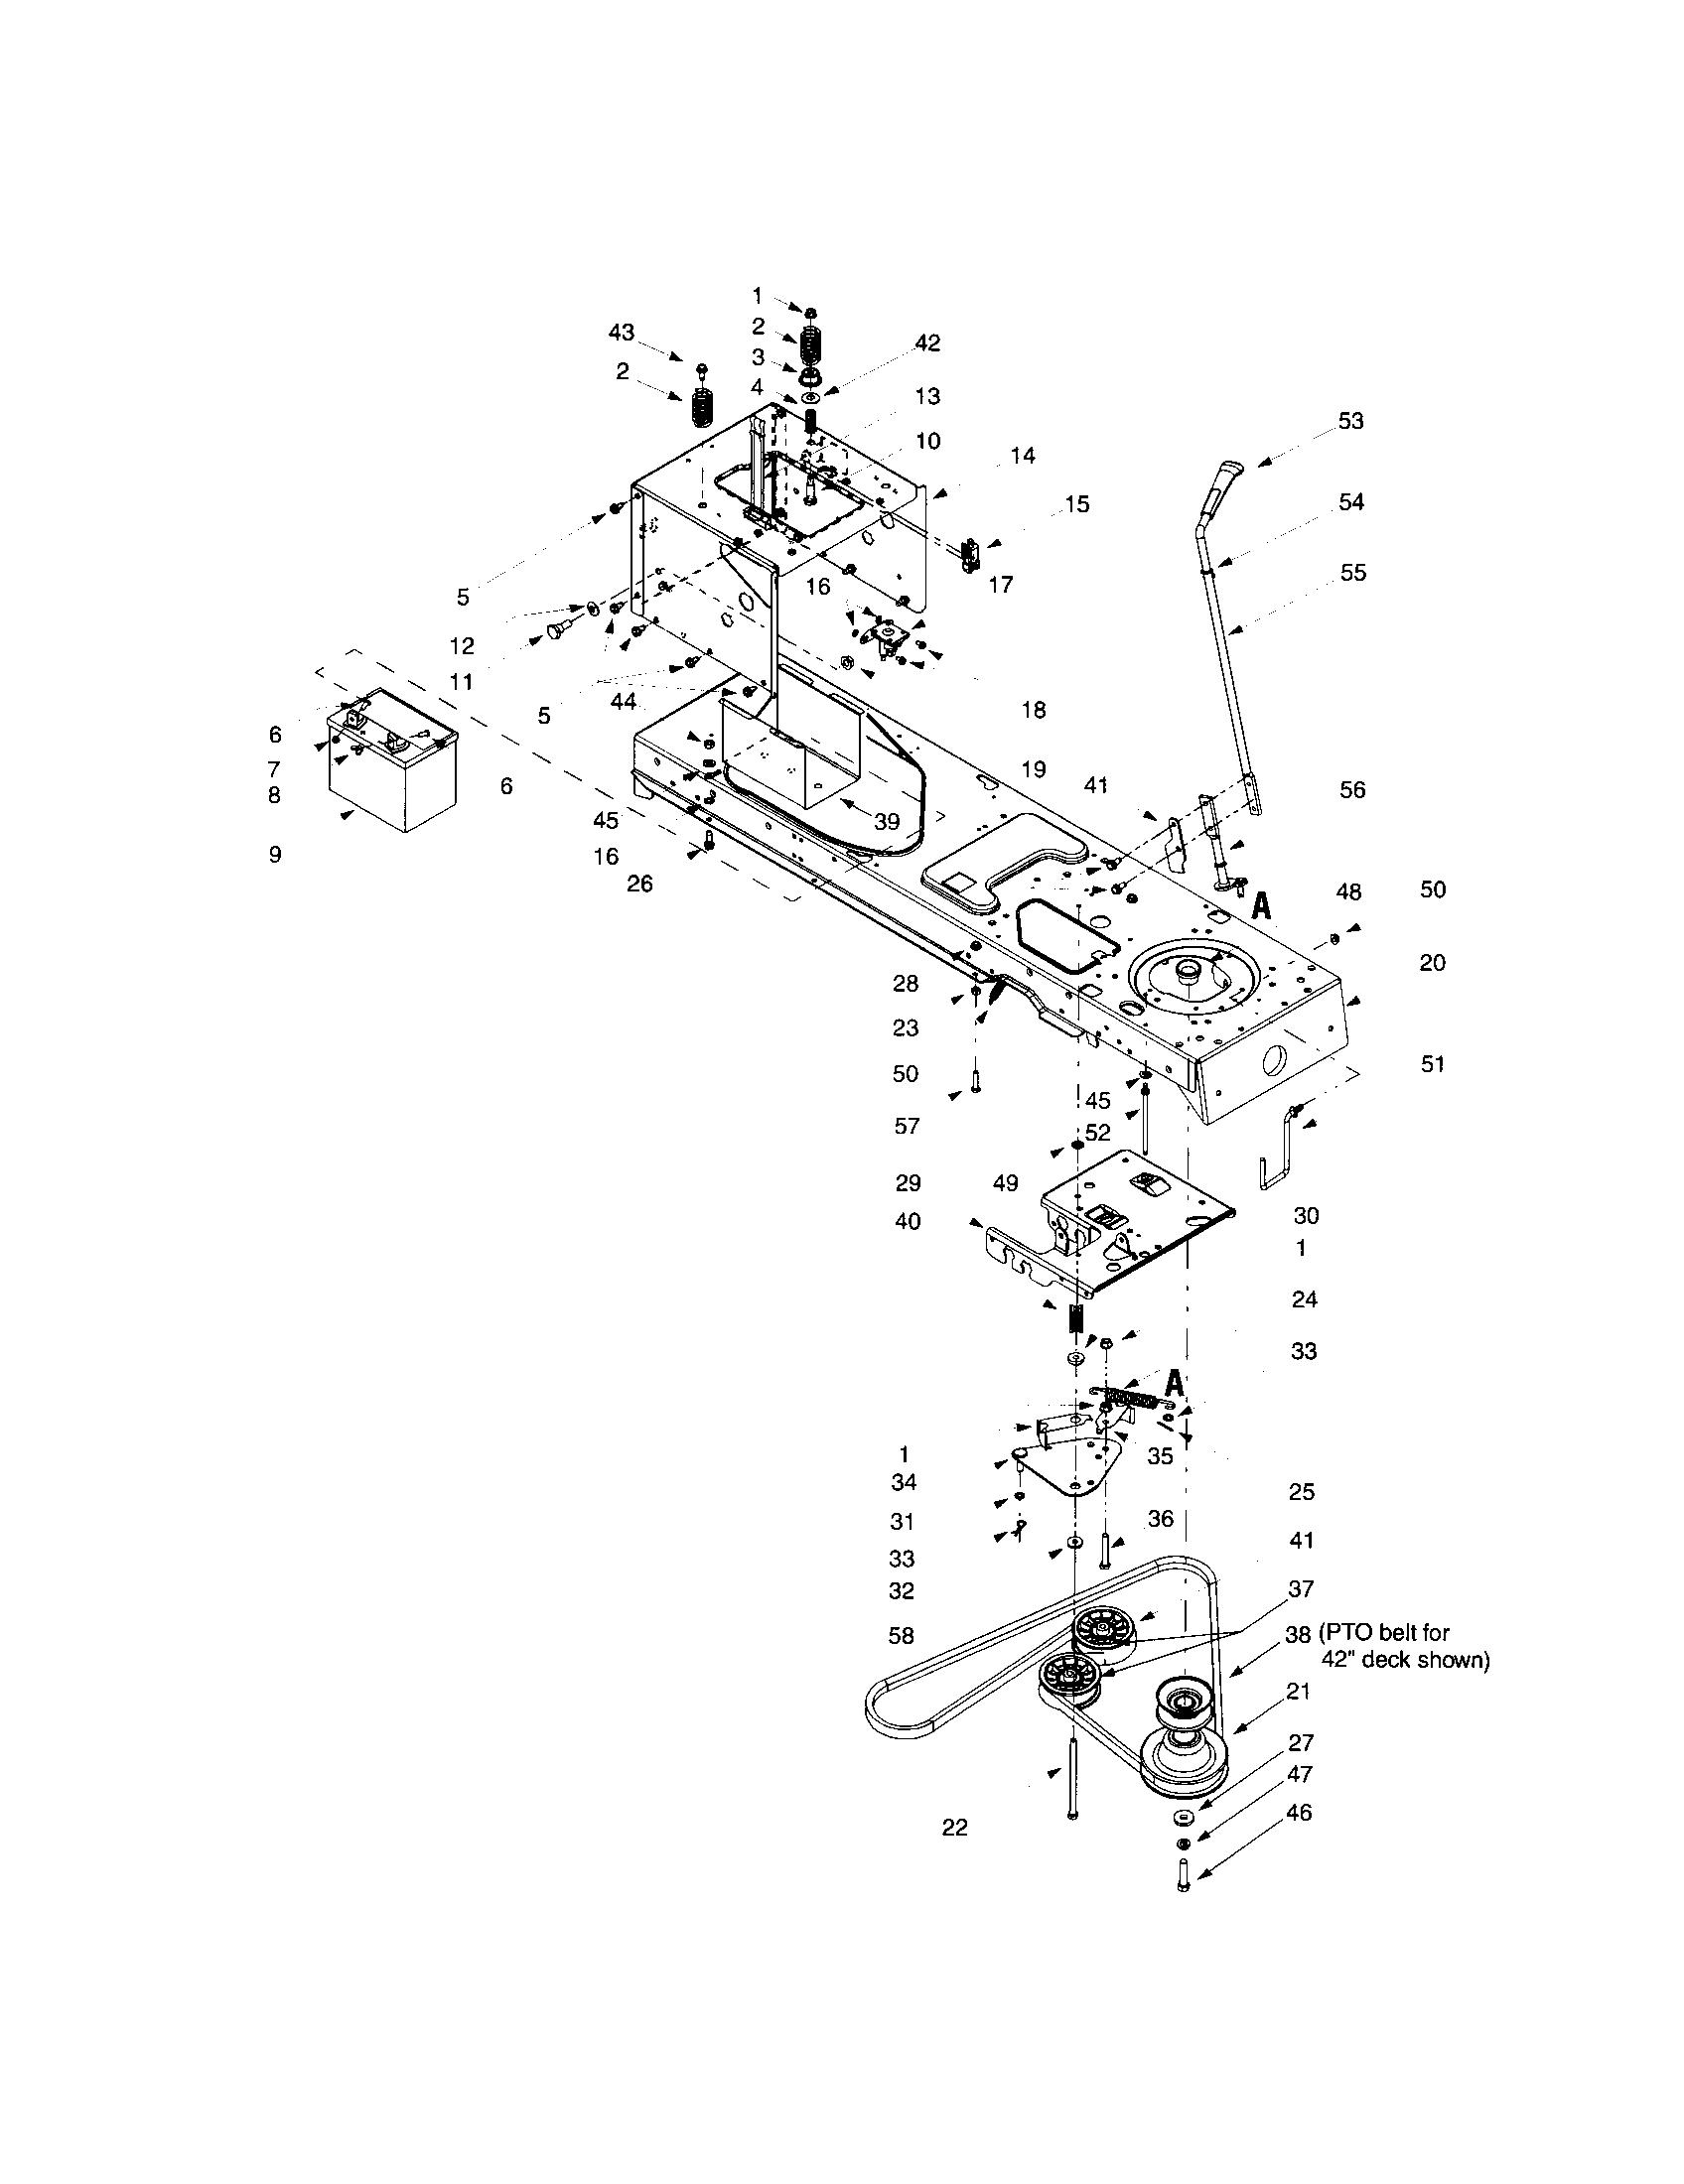 Mtd model 607 lawn, tractor genuine parts